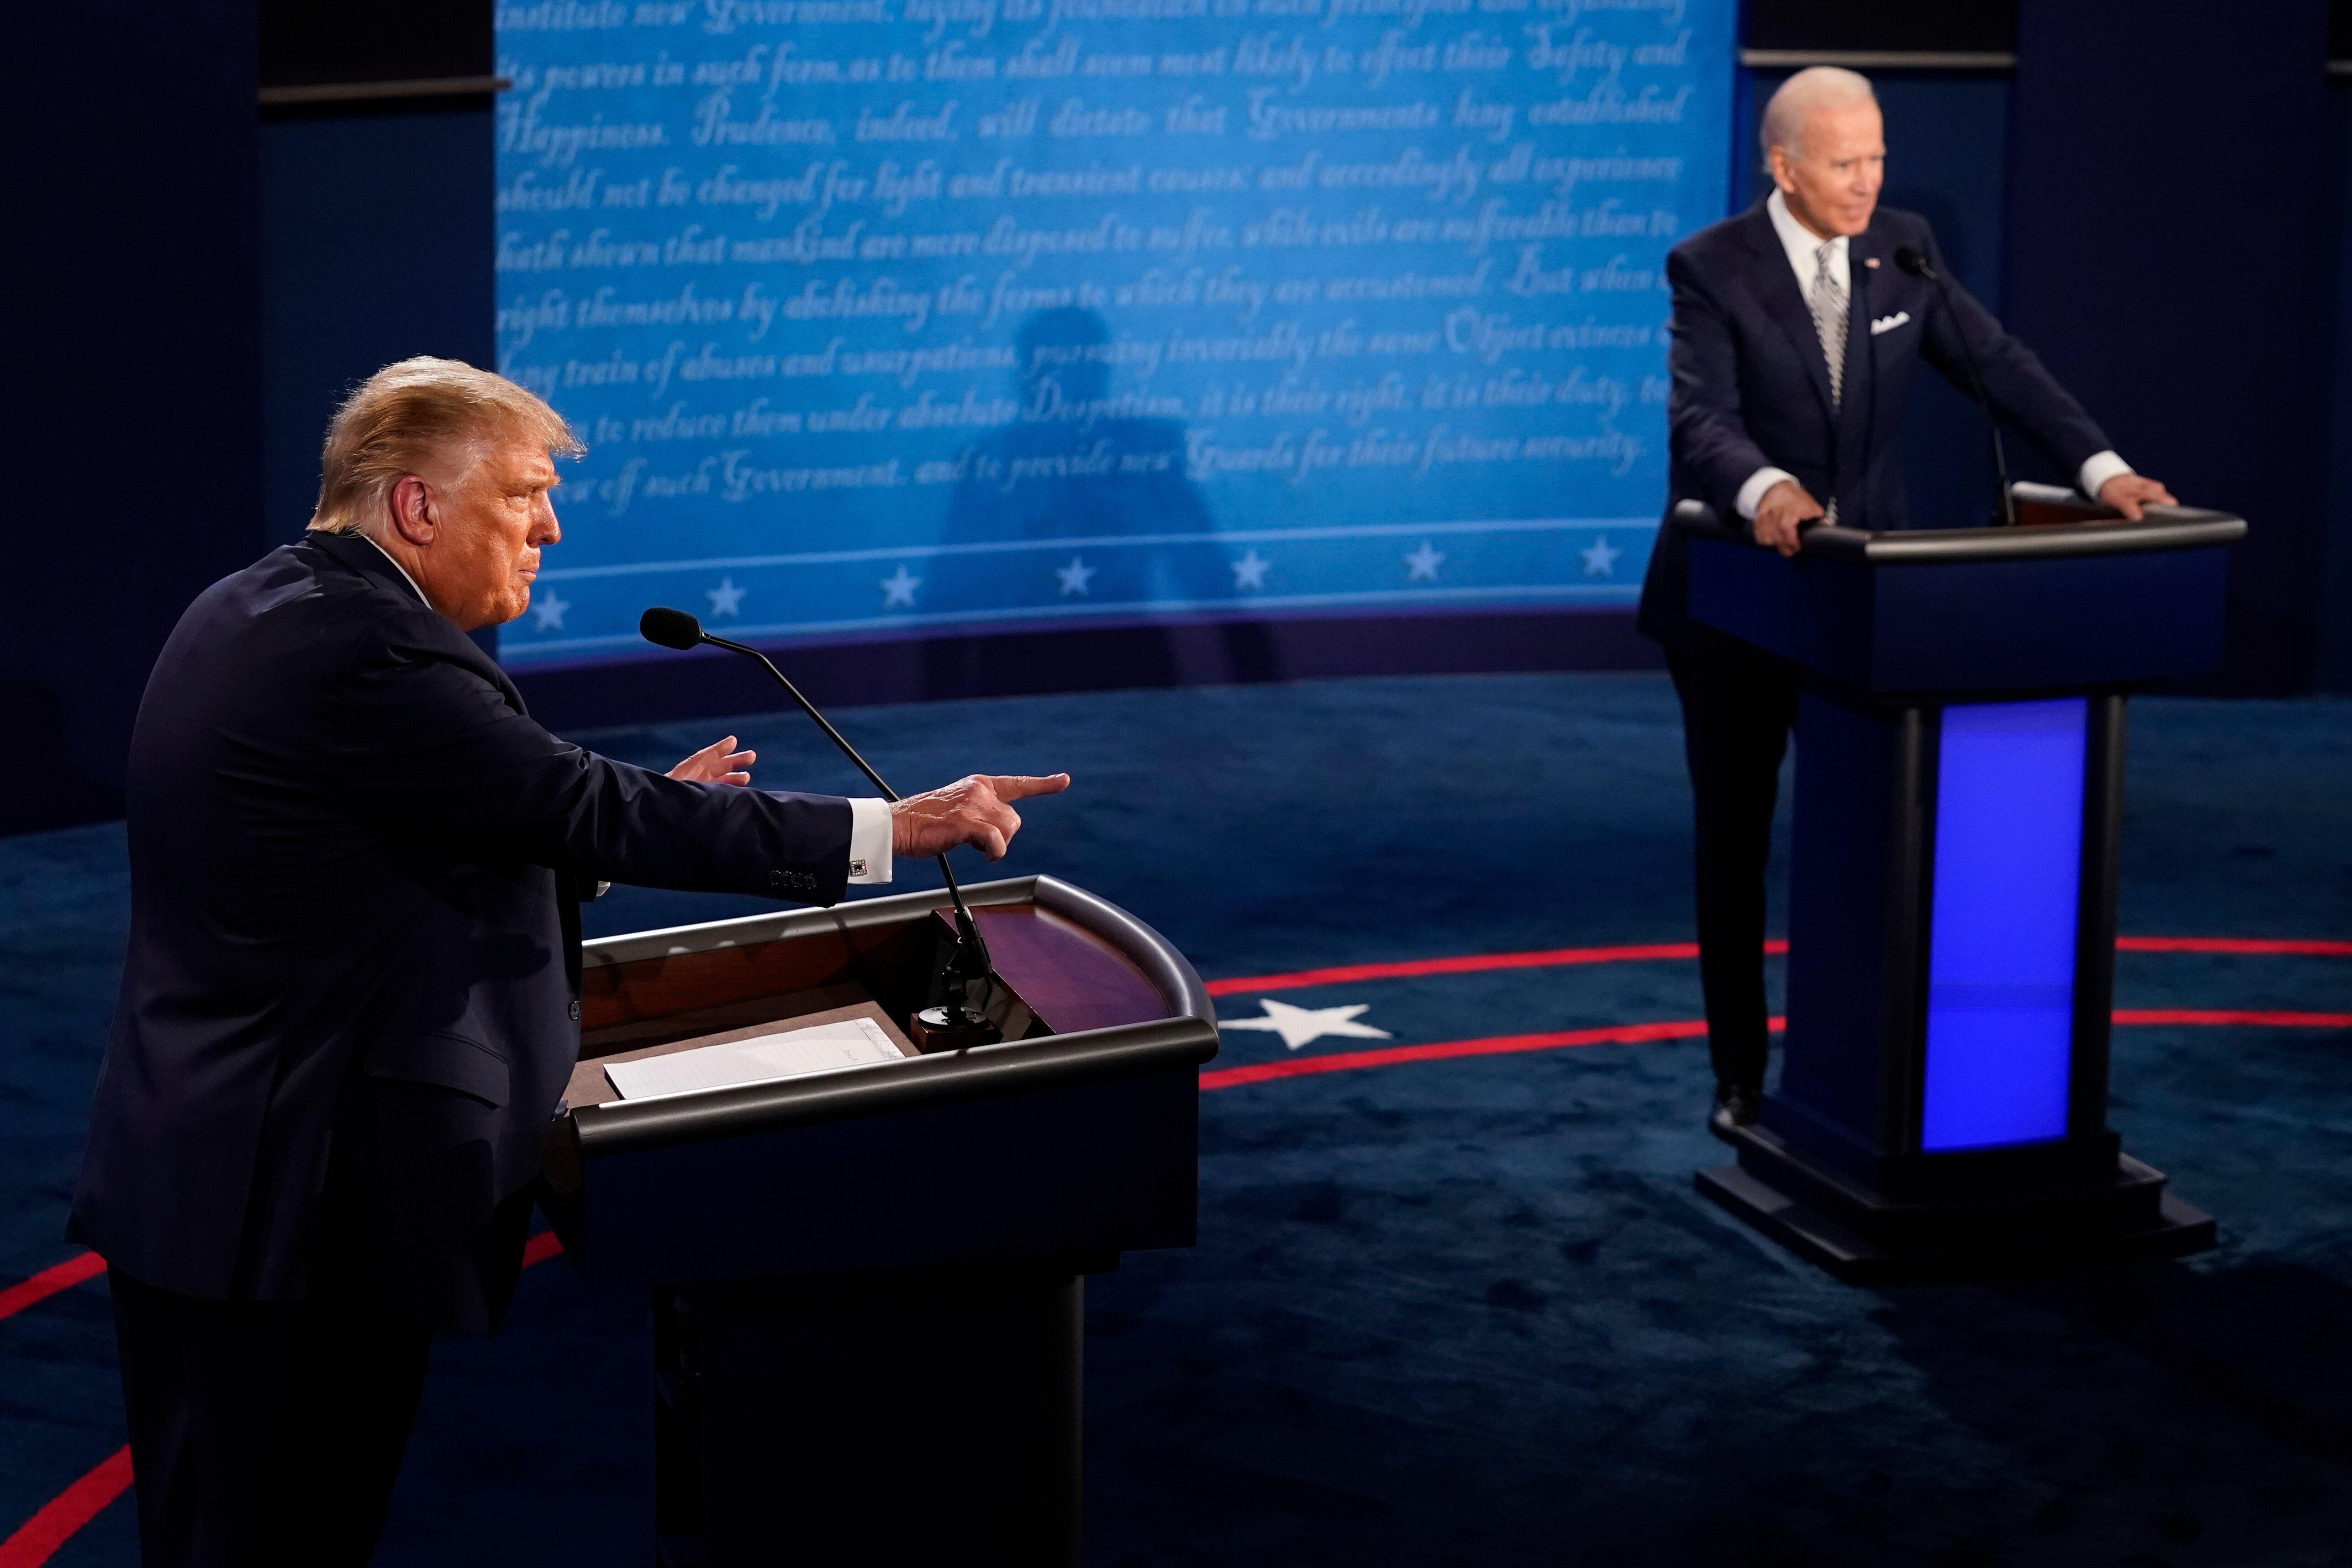 Then-President Donald Trump speaks during the first presidential debate against then-former Vice President Joe Biden on Septe